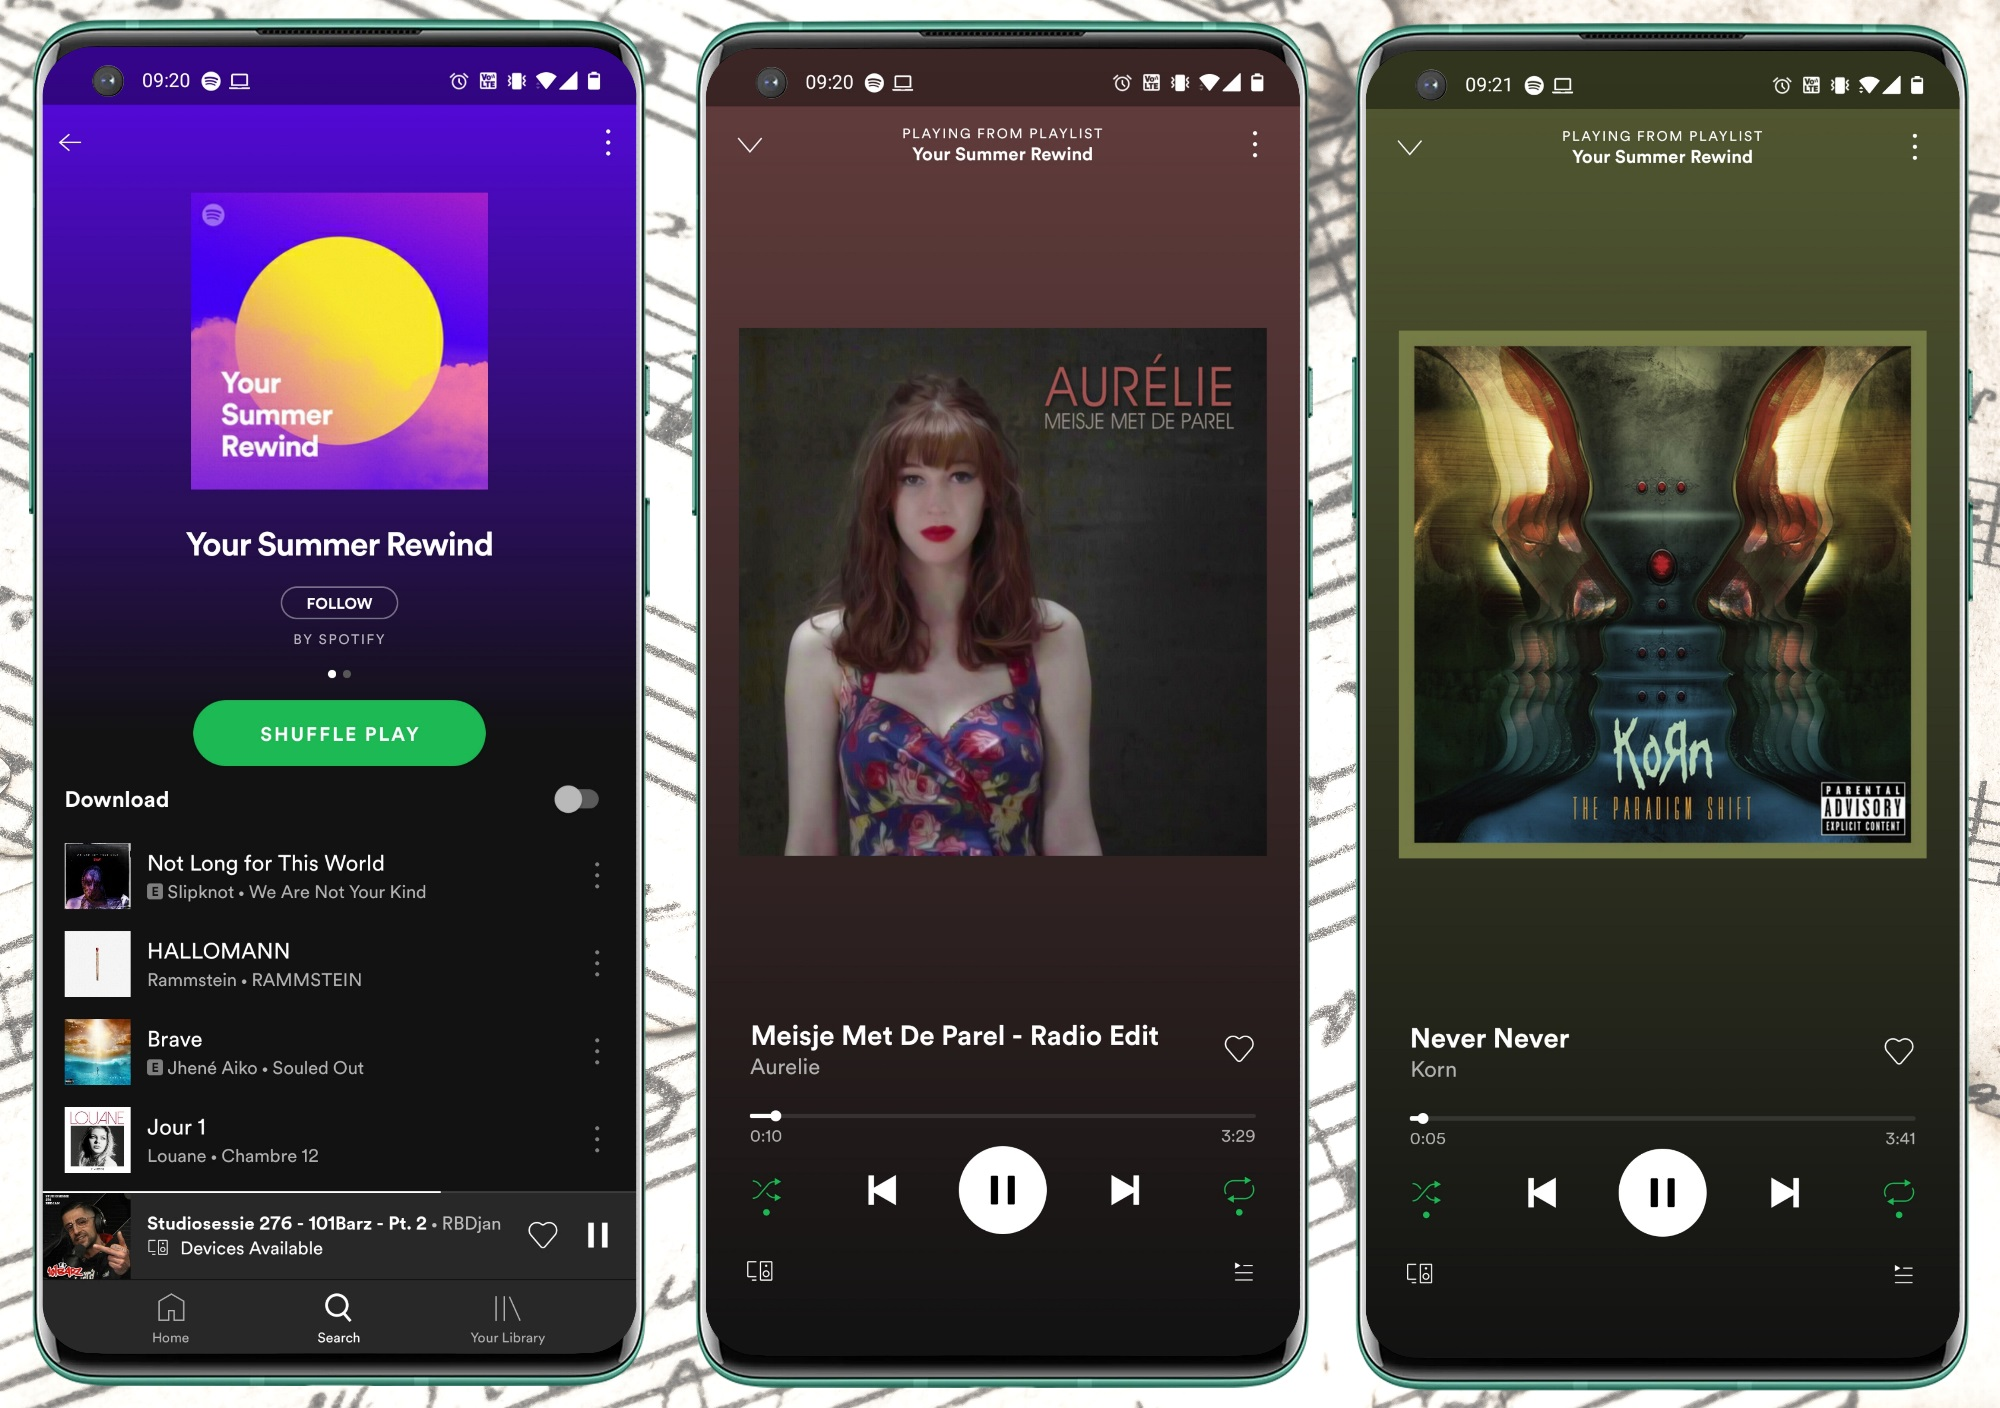 Spotify - Your Summer Rewind